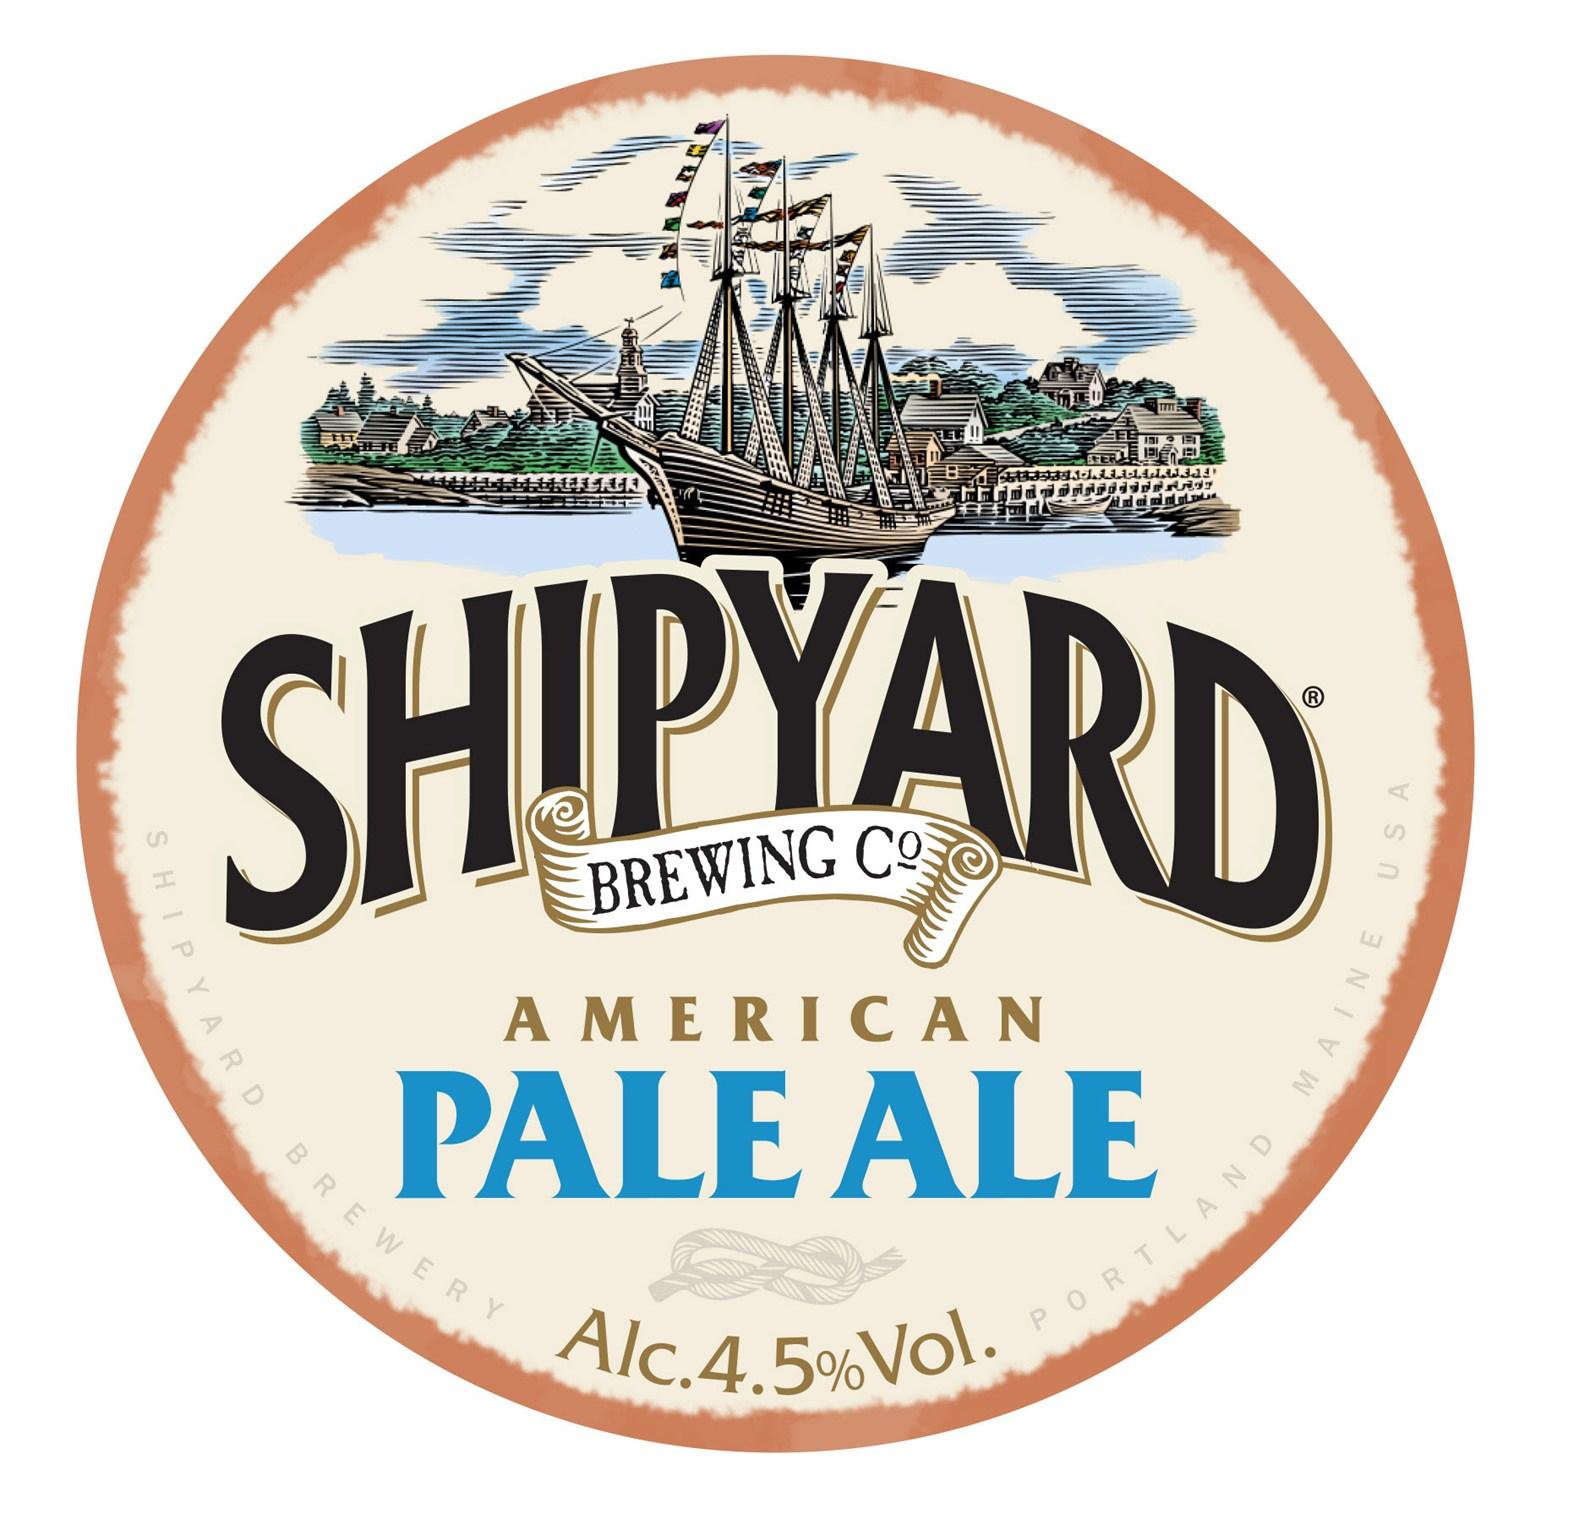 Marstons Shipyard - American Pale Ale